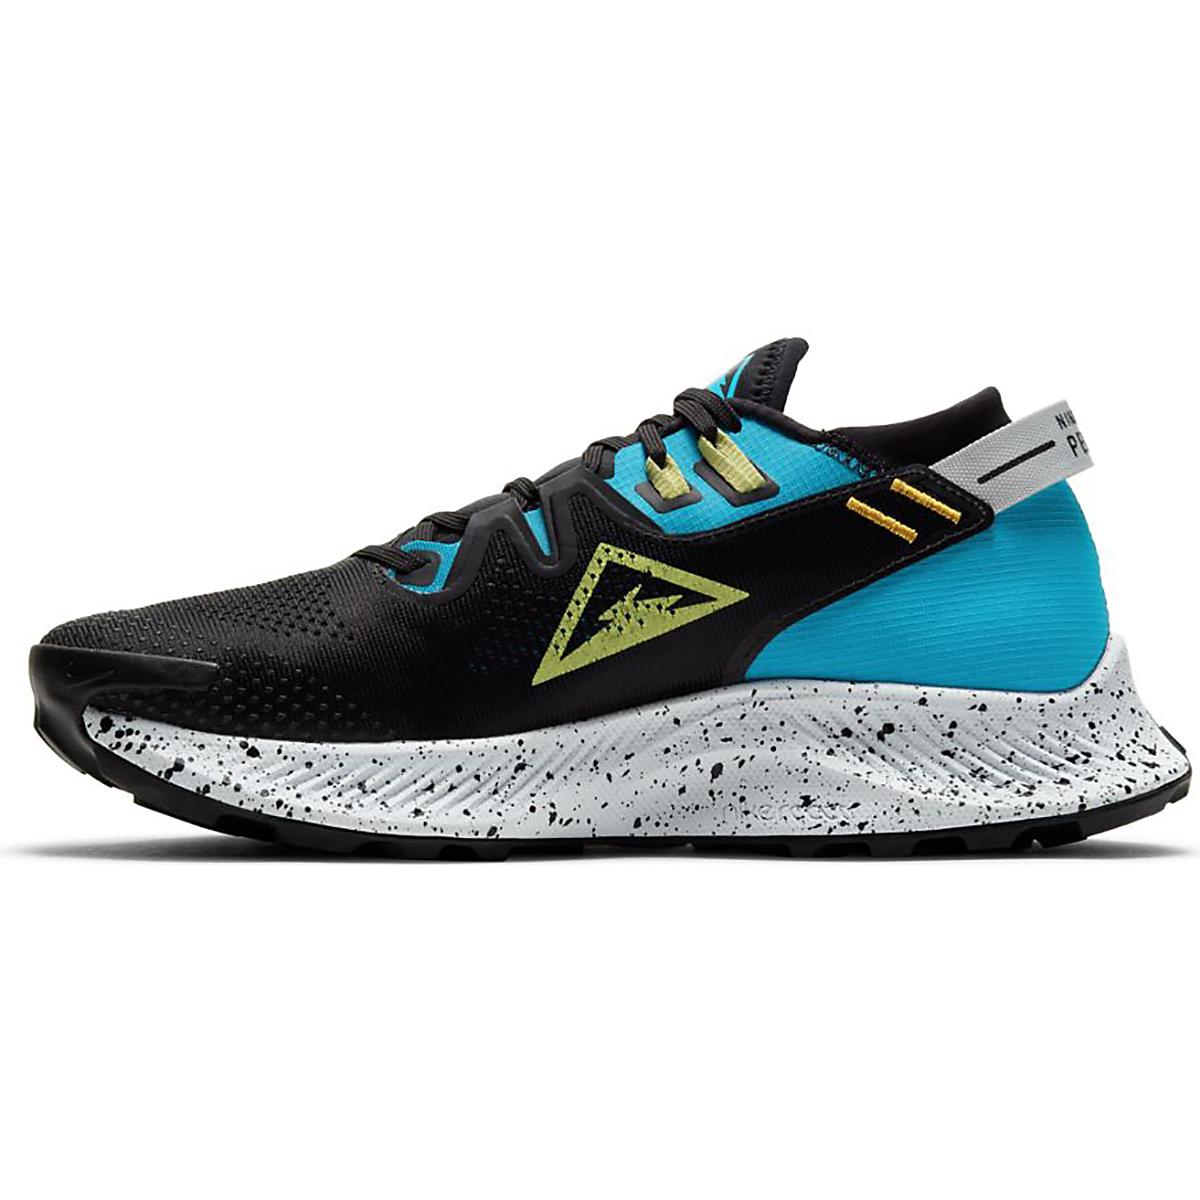 Women's Nike Pegasus Trail 2 Trail Running Shoe - Color: Off Noir/Limelight-Laser Blue - Size: 5 - Width: Regular, Off Noir/Limelight-Laser Blue, large, image 2